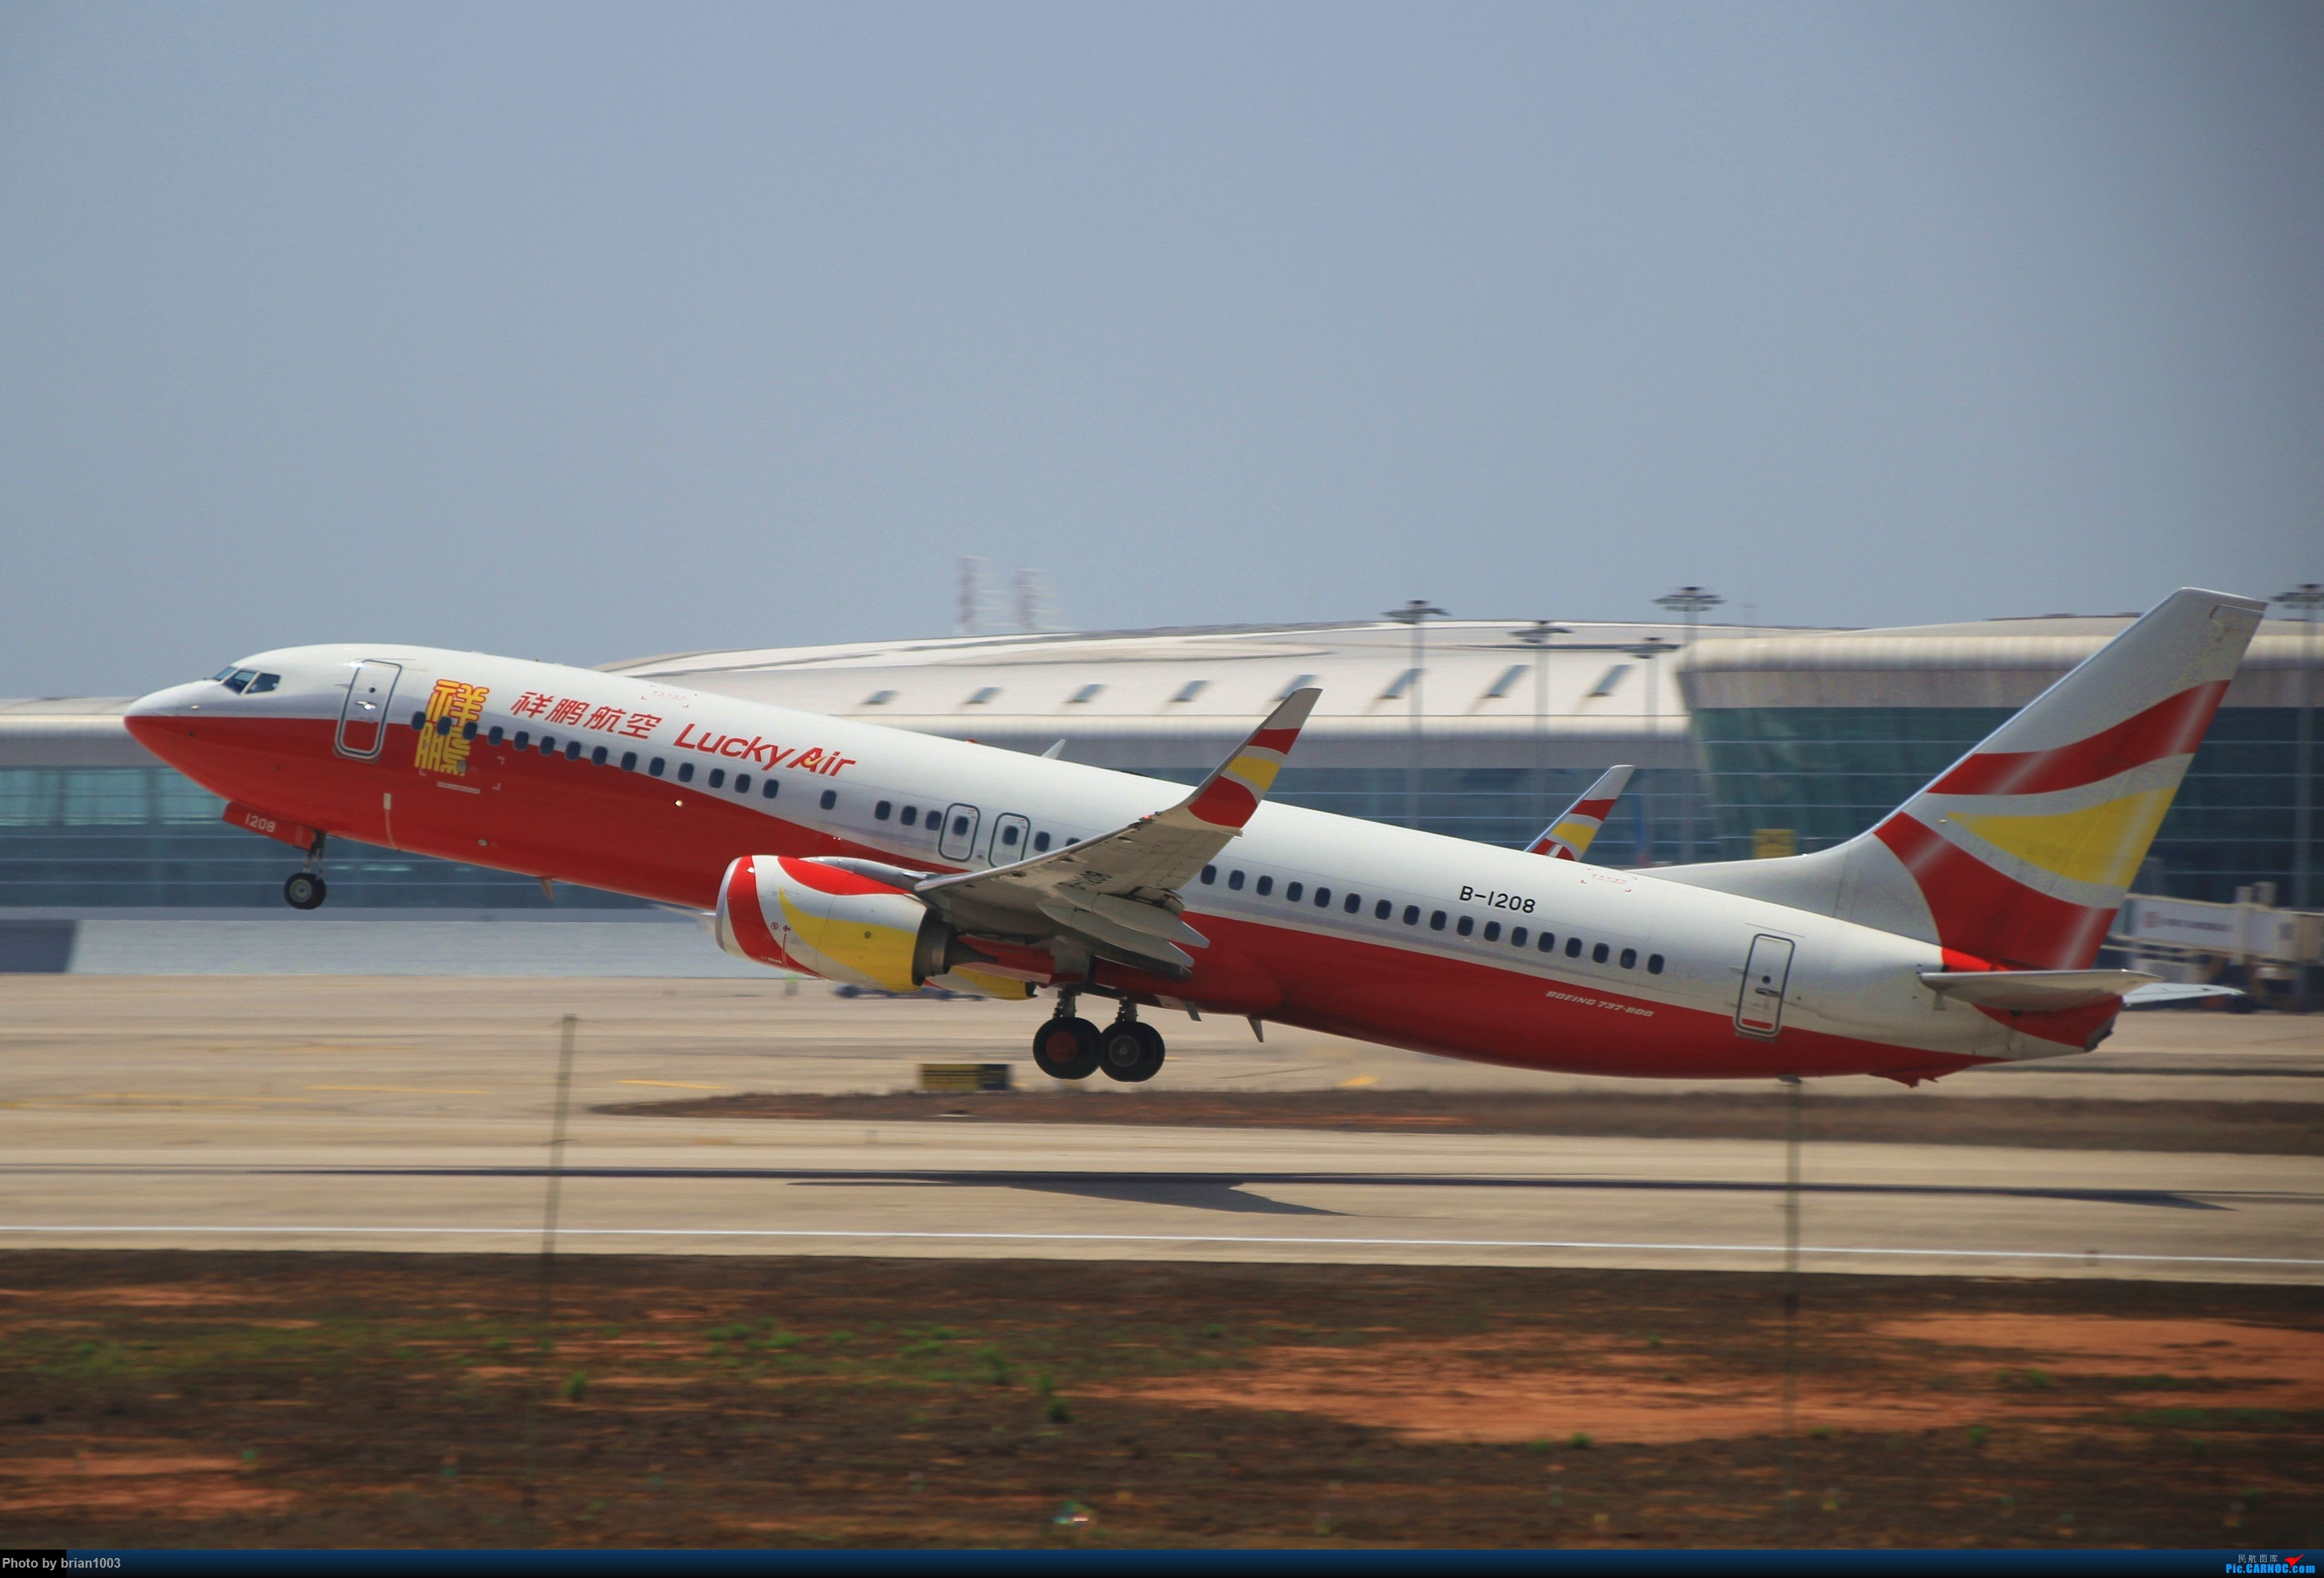 Re:[原创]WUH武汉天河机场拍机之喜迎酷航788和偶遇某其他飞机 BOEING 737-800 B-1208